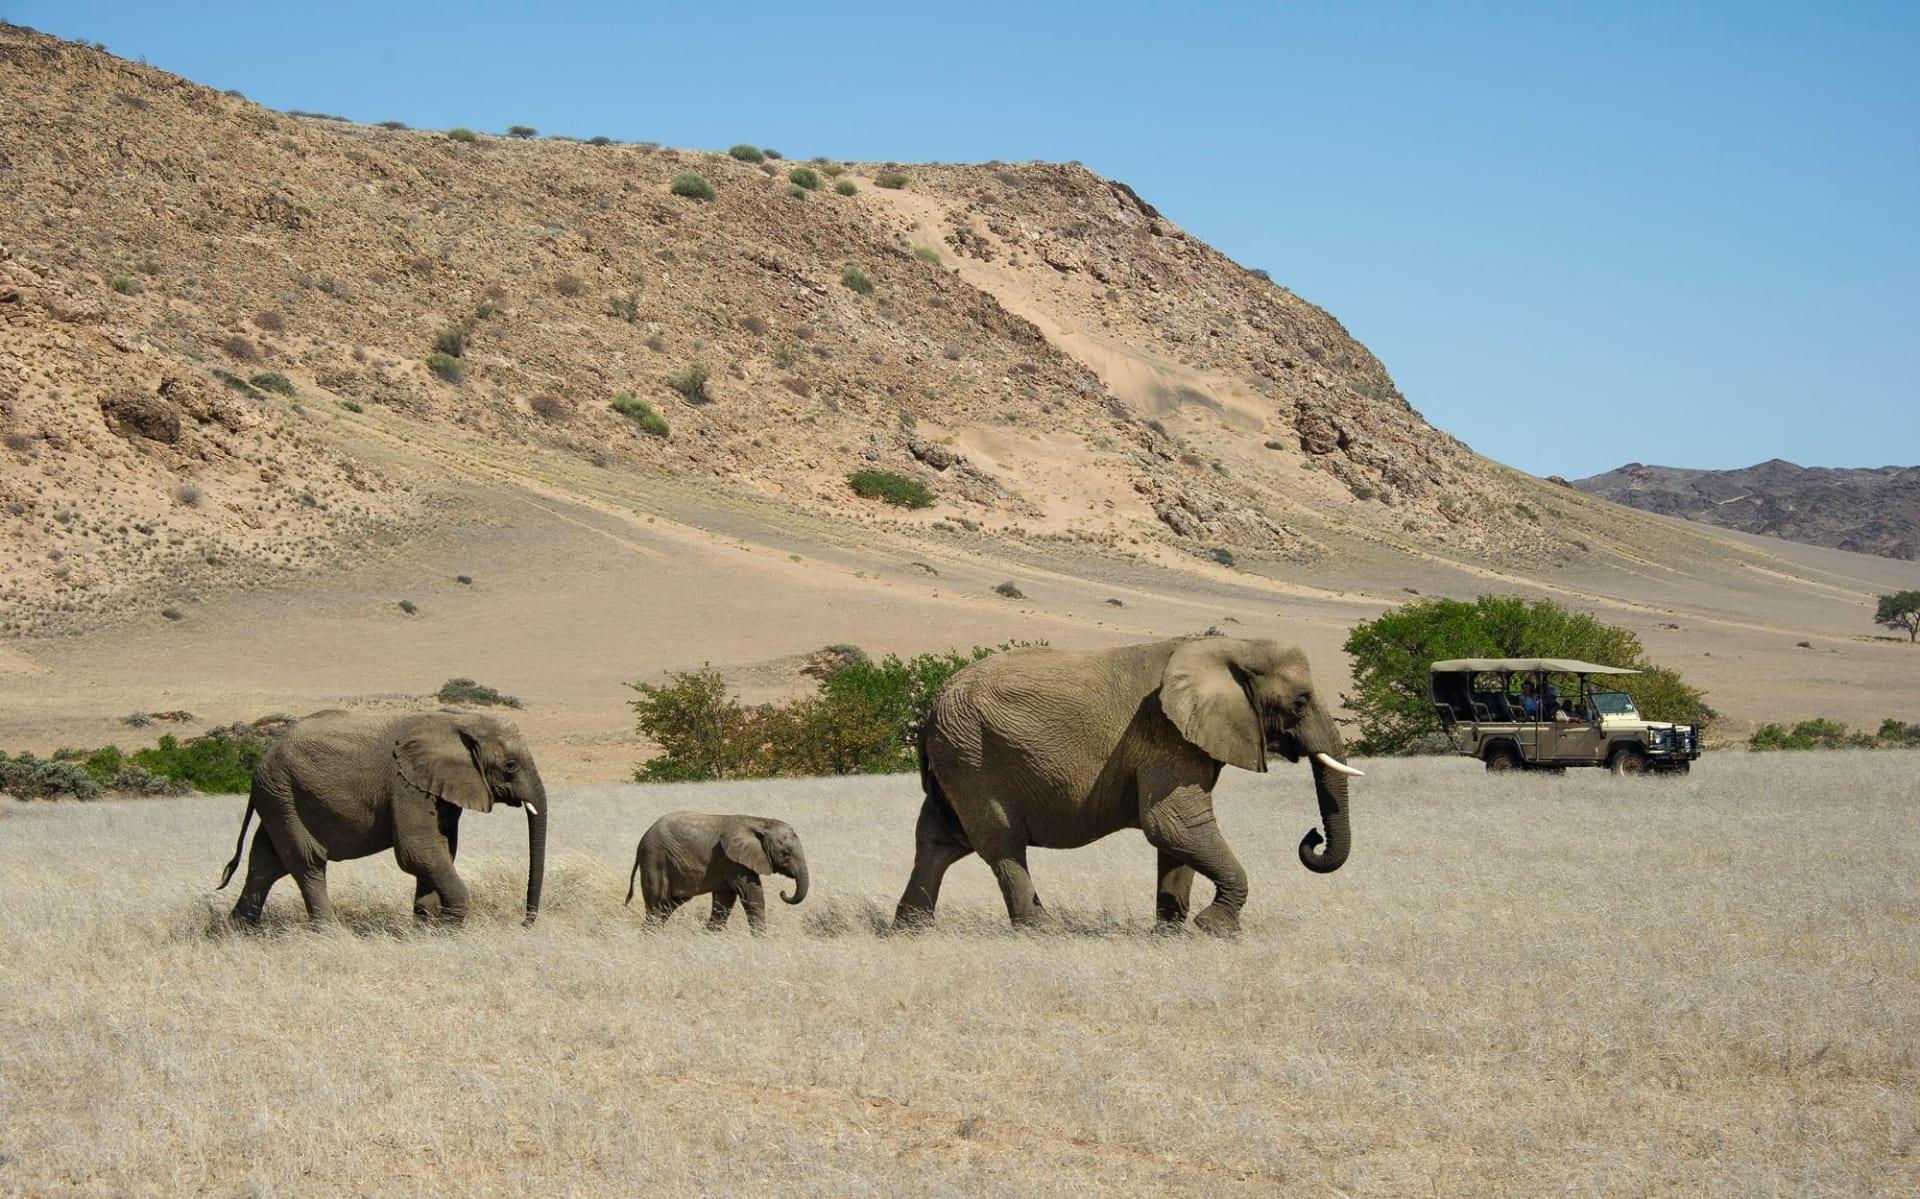 Namibia Deluxe ab Windhoek Stadt: Namibia - Elephant